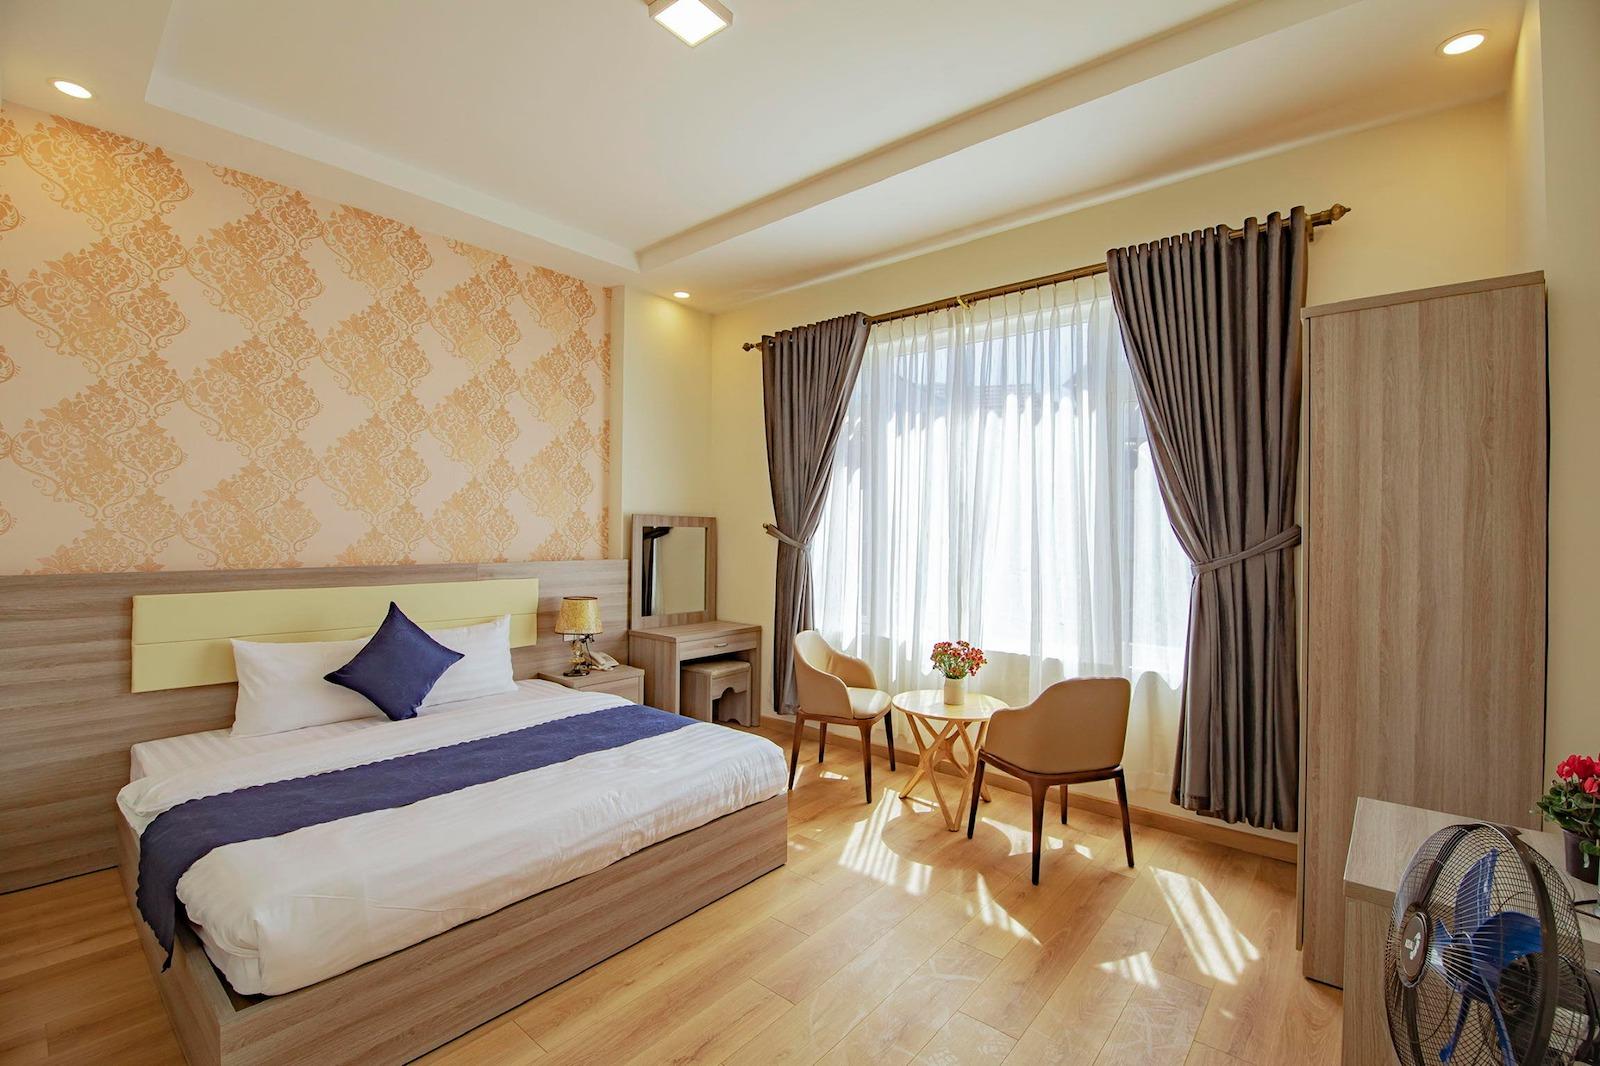 Image of a room at the Khan Uyen Hotel in Da Lat, Vietnam